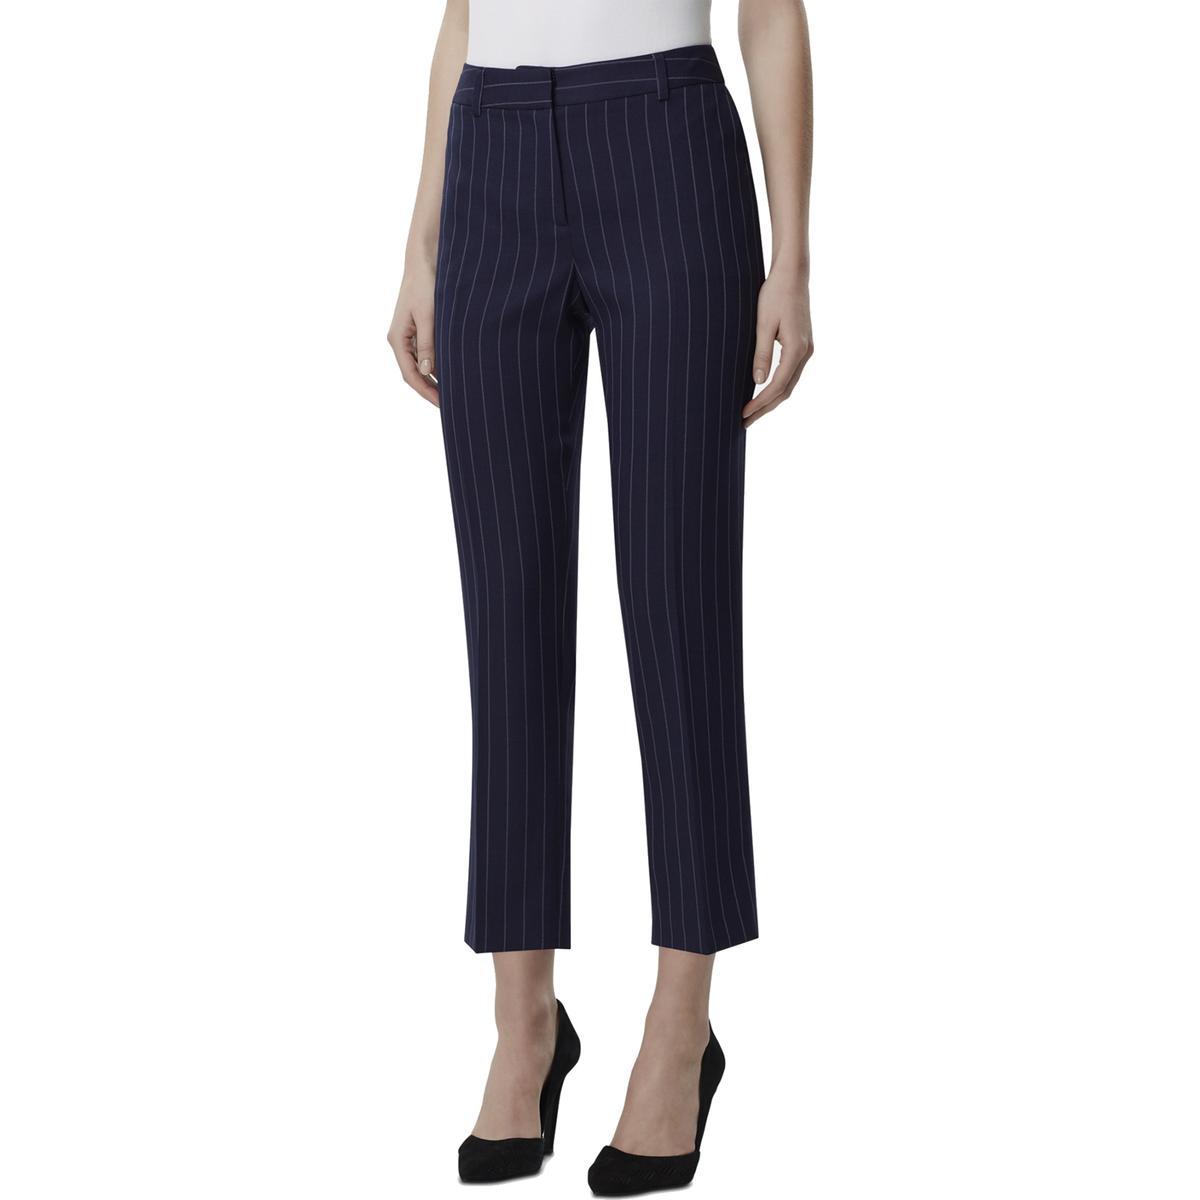 Alfani Womens Textured Geometric Control Top Ankle Pants Plus BHFO 3926